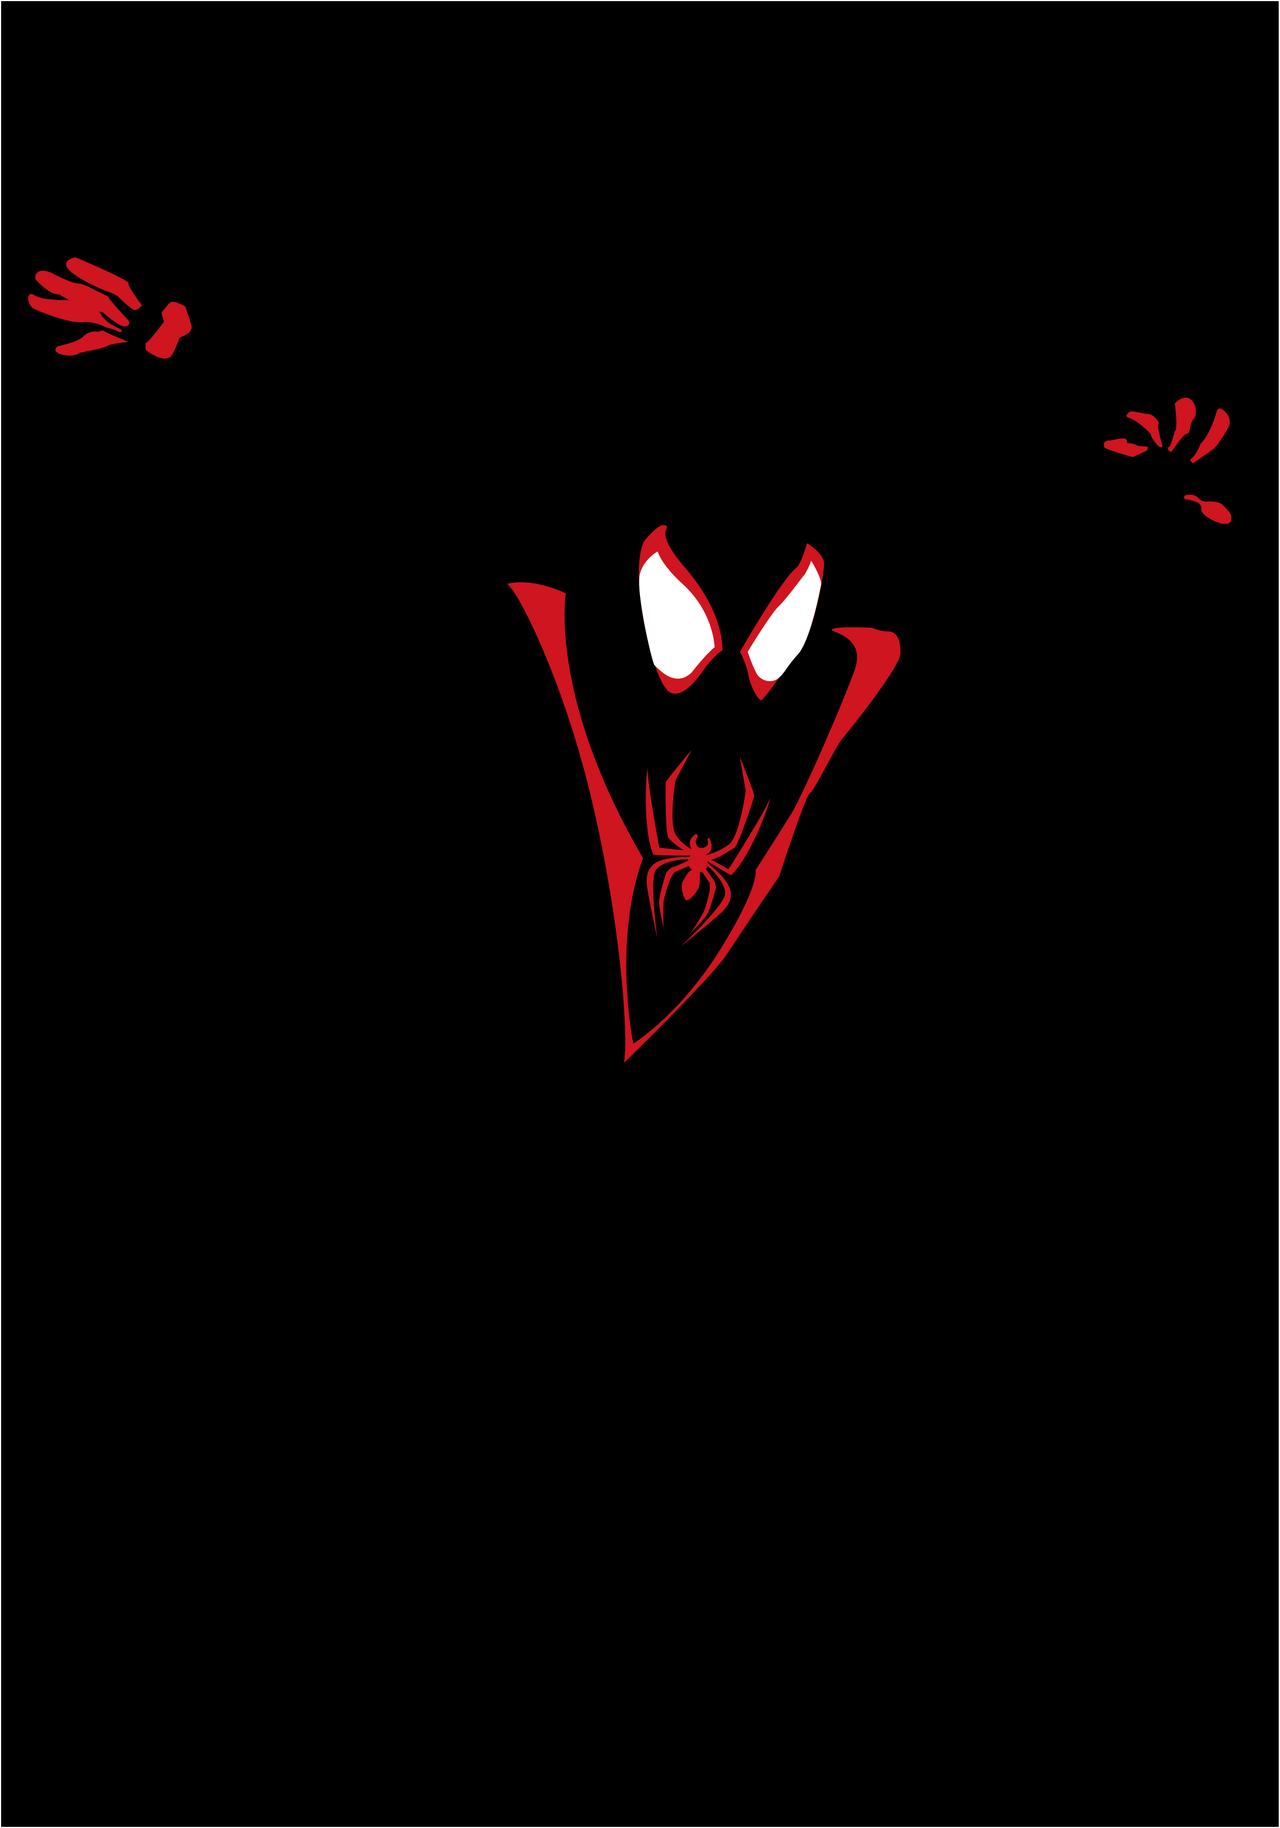 Pin De Chrishean Videshana En Epic Characters Spiderman Fondo De Pantalla De Avengers Fondos De Comic